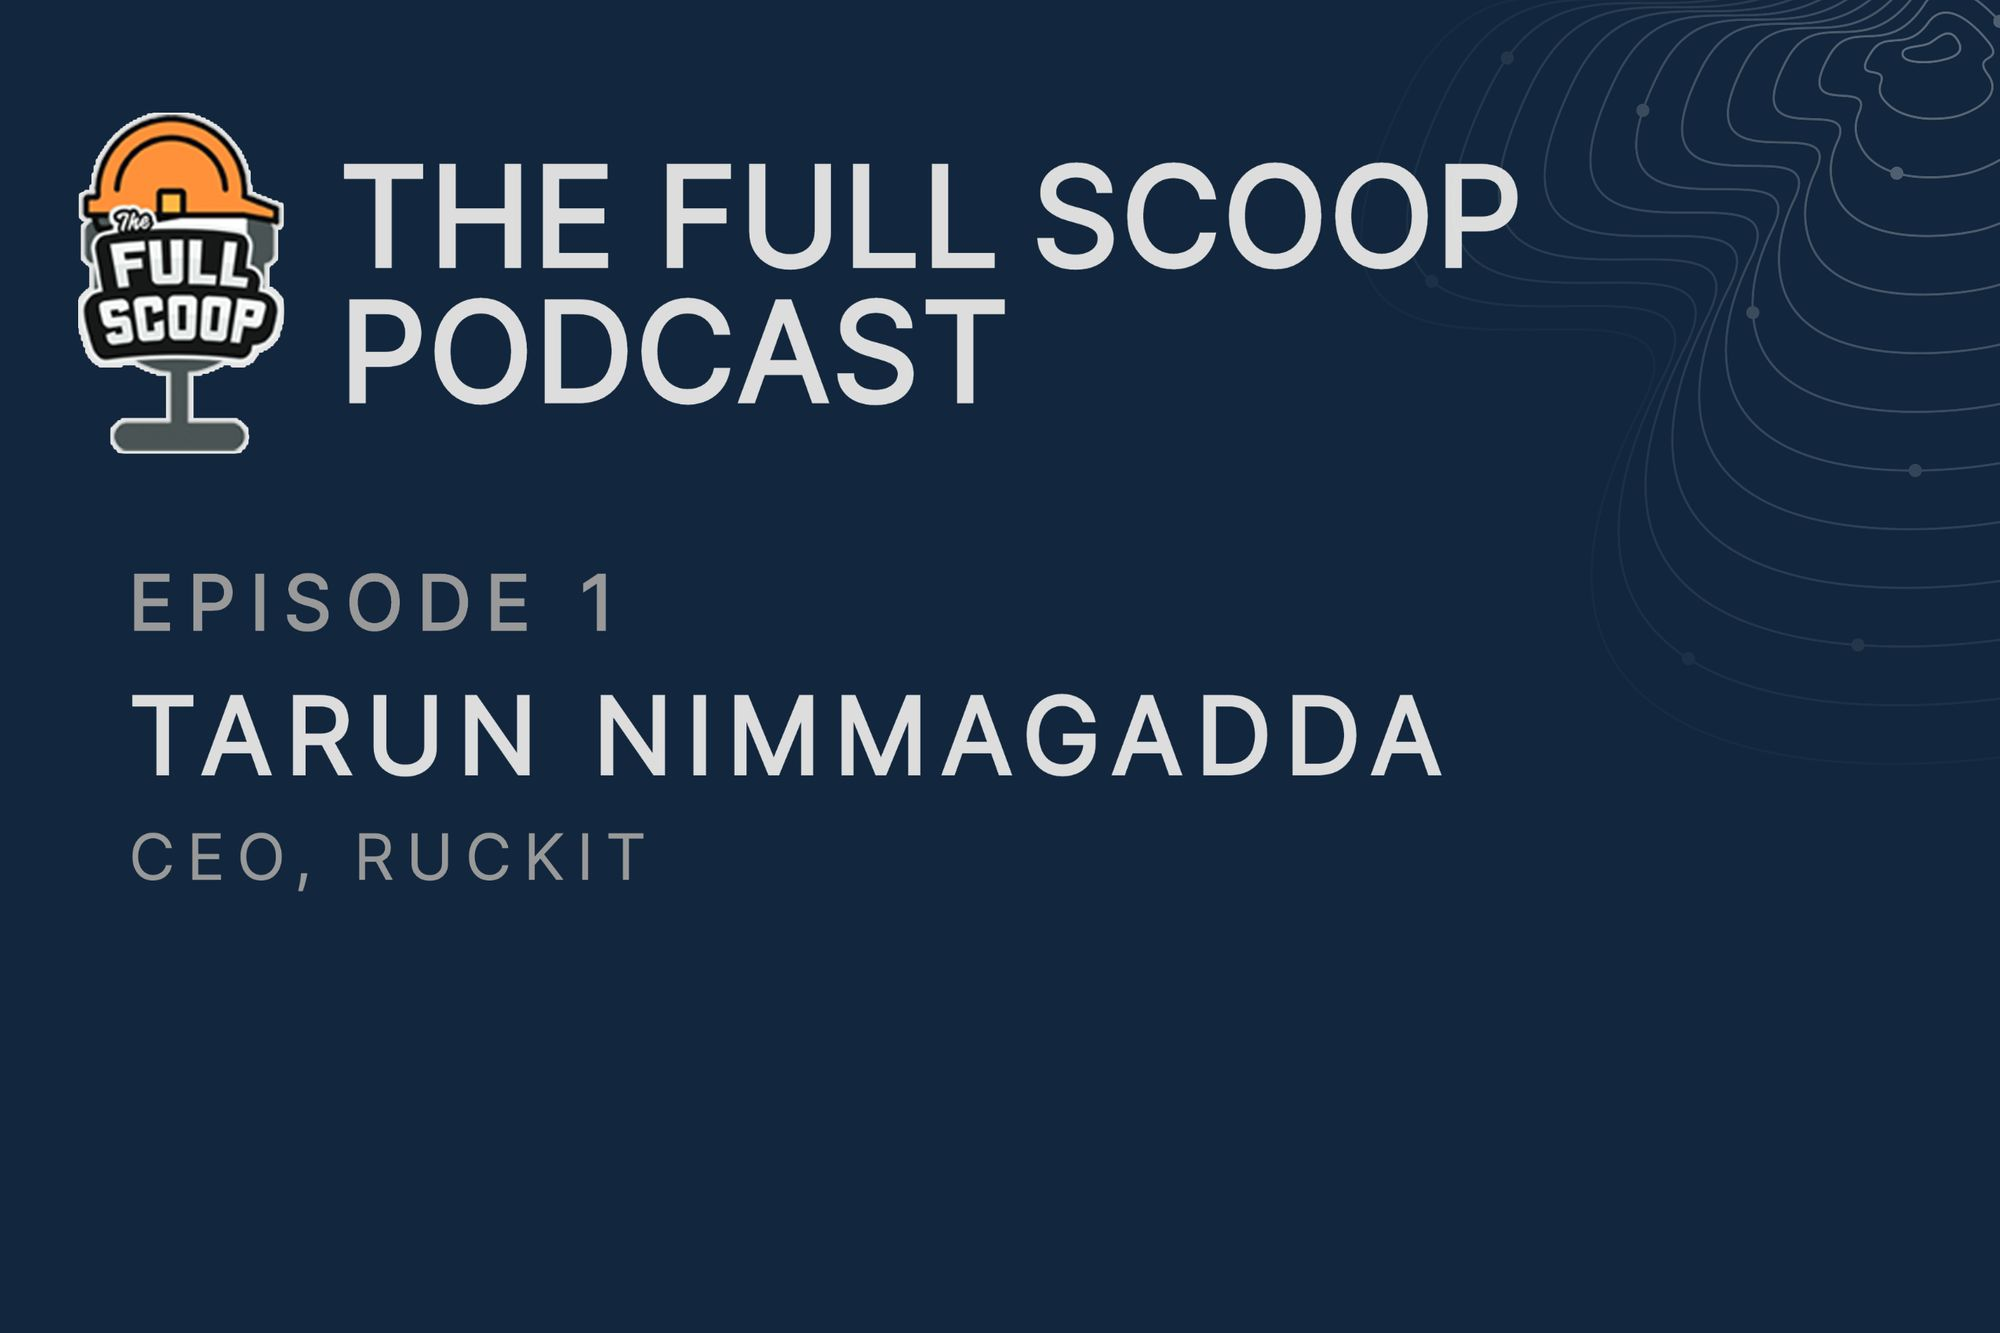 Episode 1: Tarun Nimmagadda, CEO at Ruckit